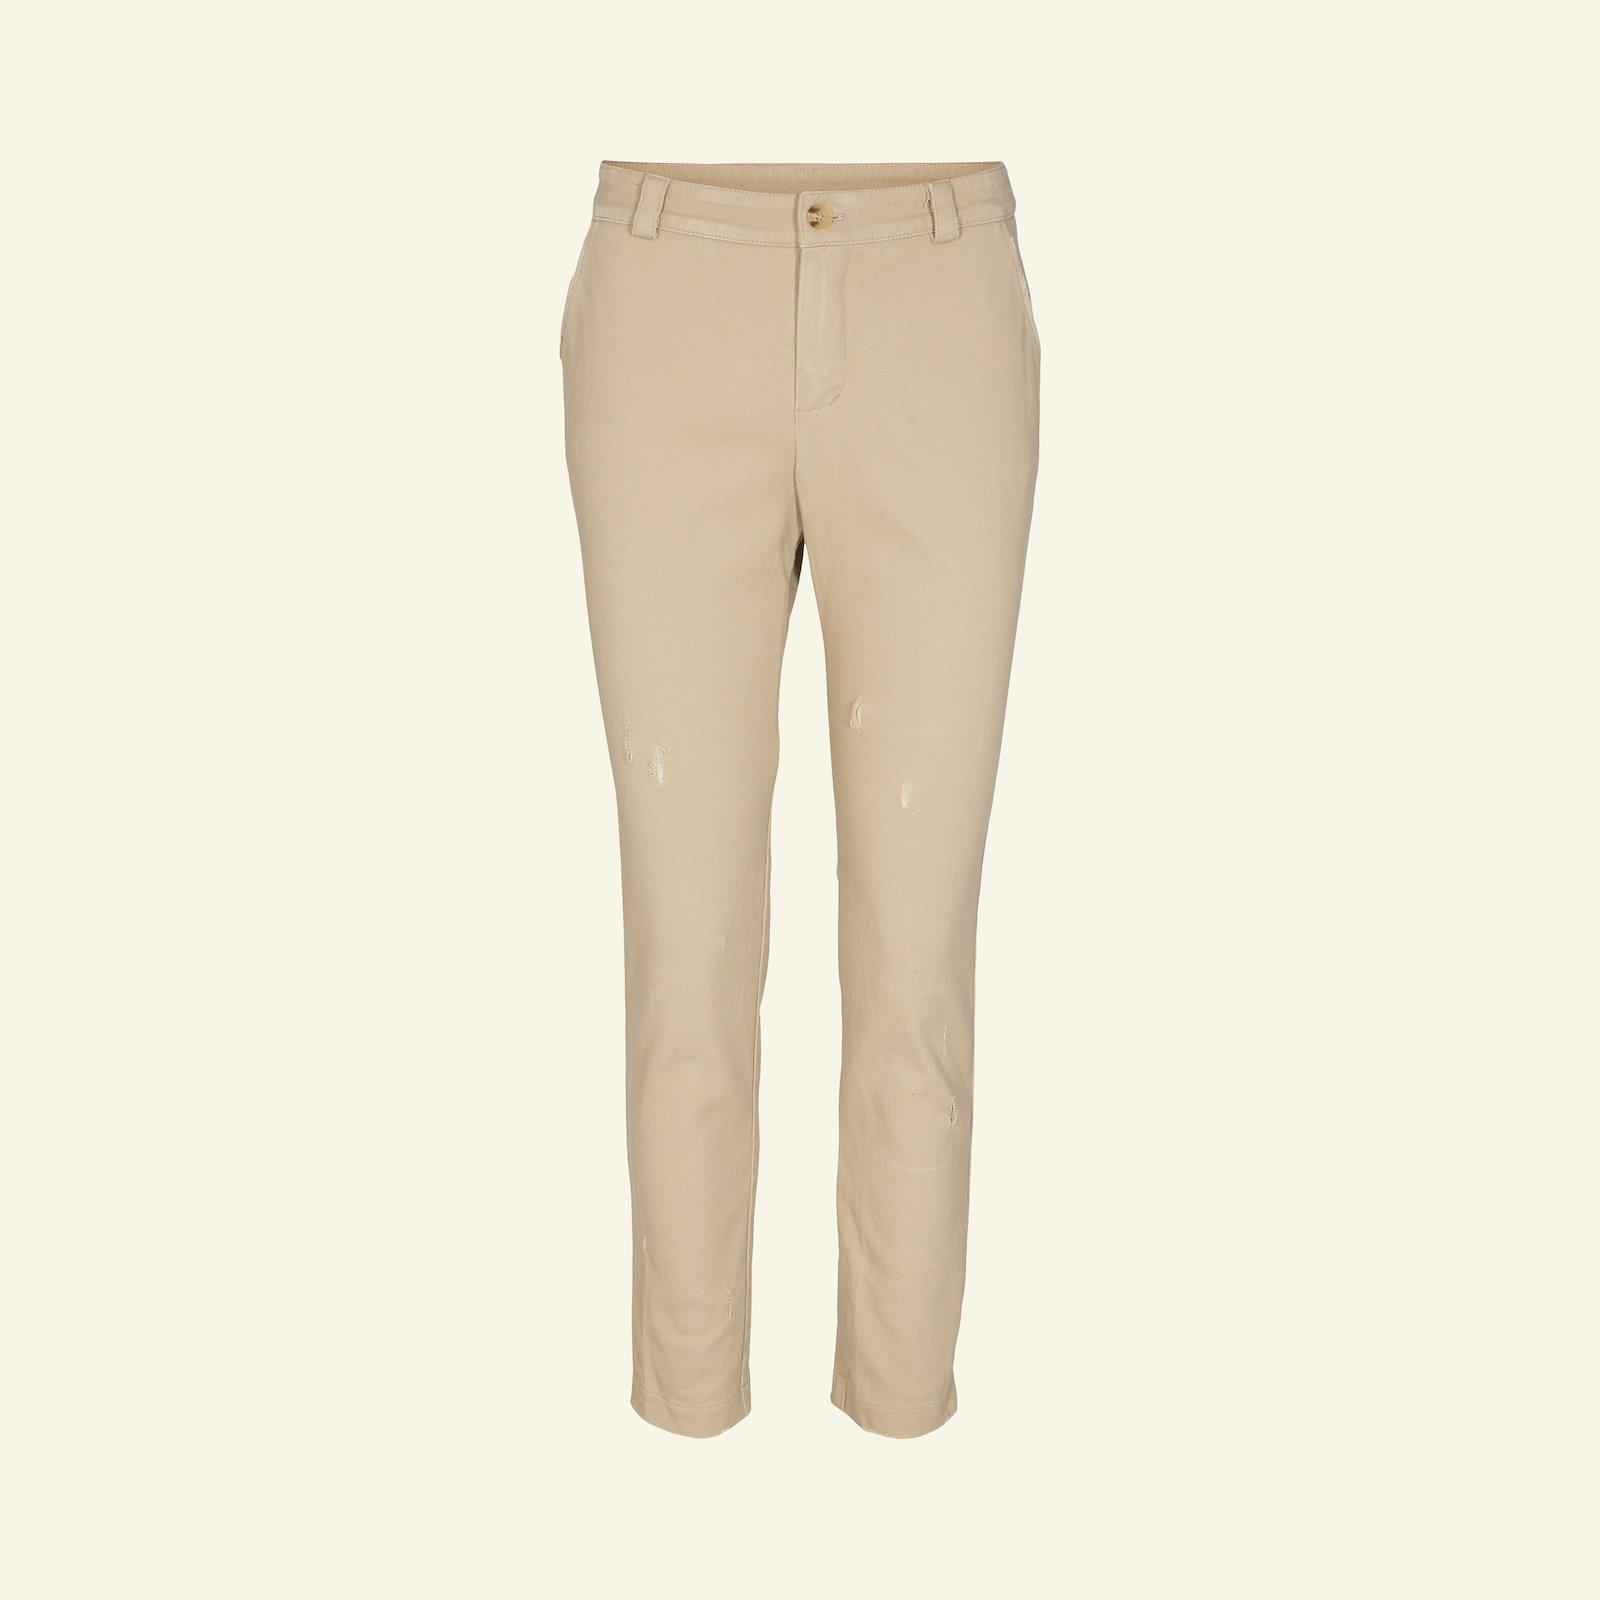 Trousers, 46/18 p20033_460842_sskit